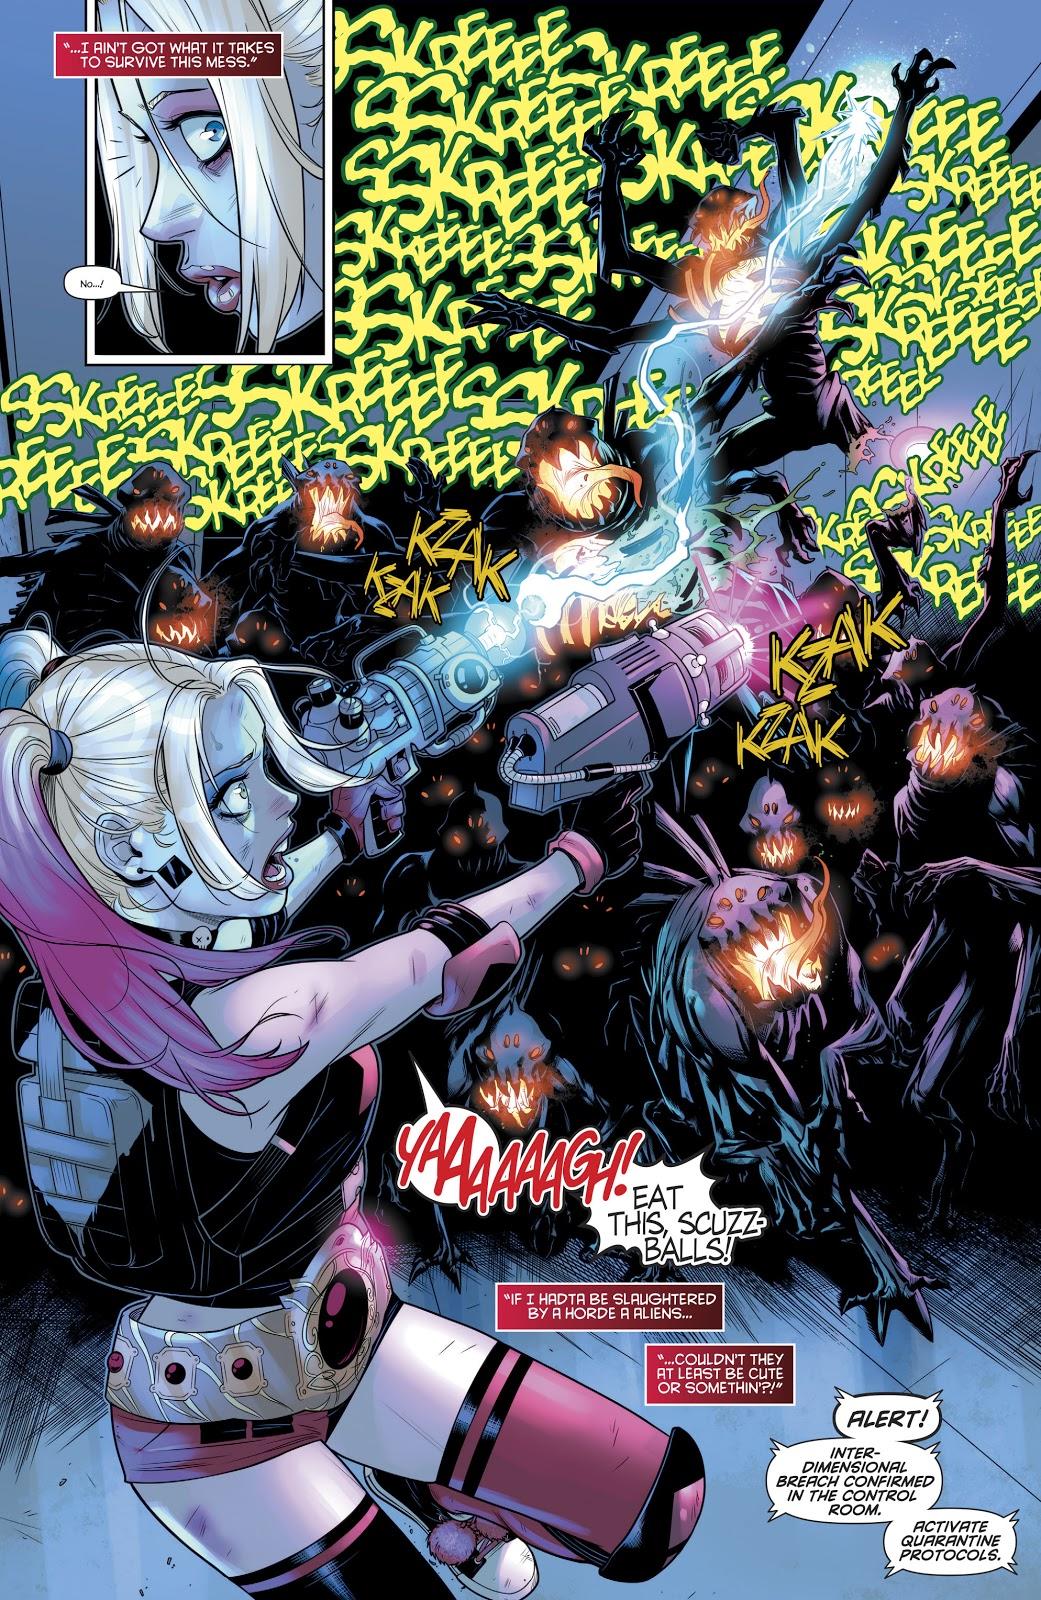 Harley Quinn Vol. 3 #60